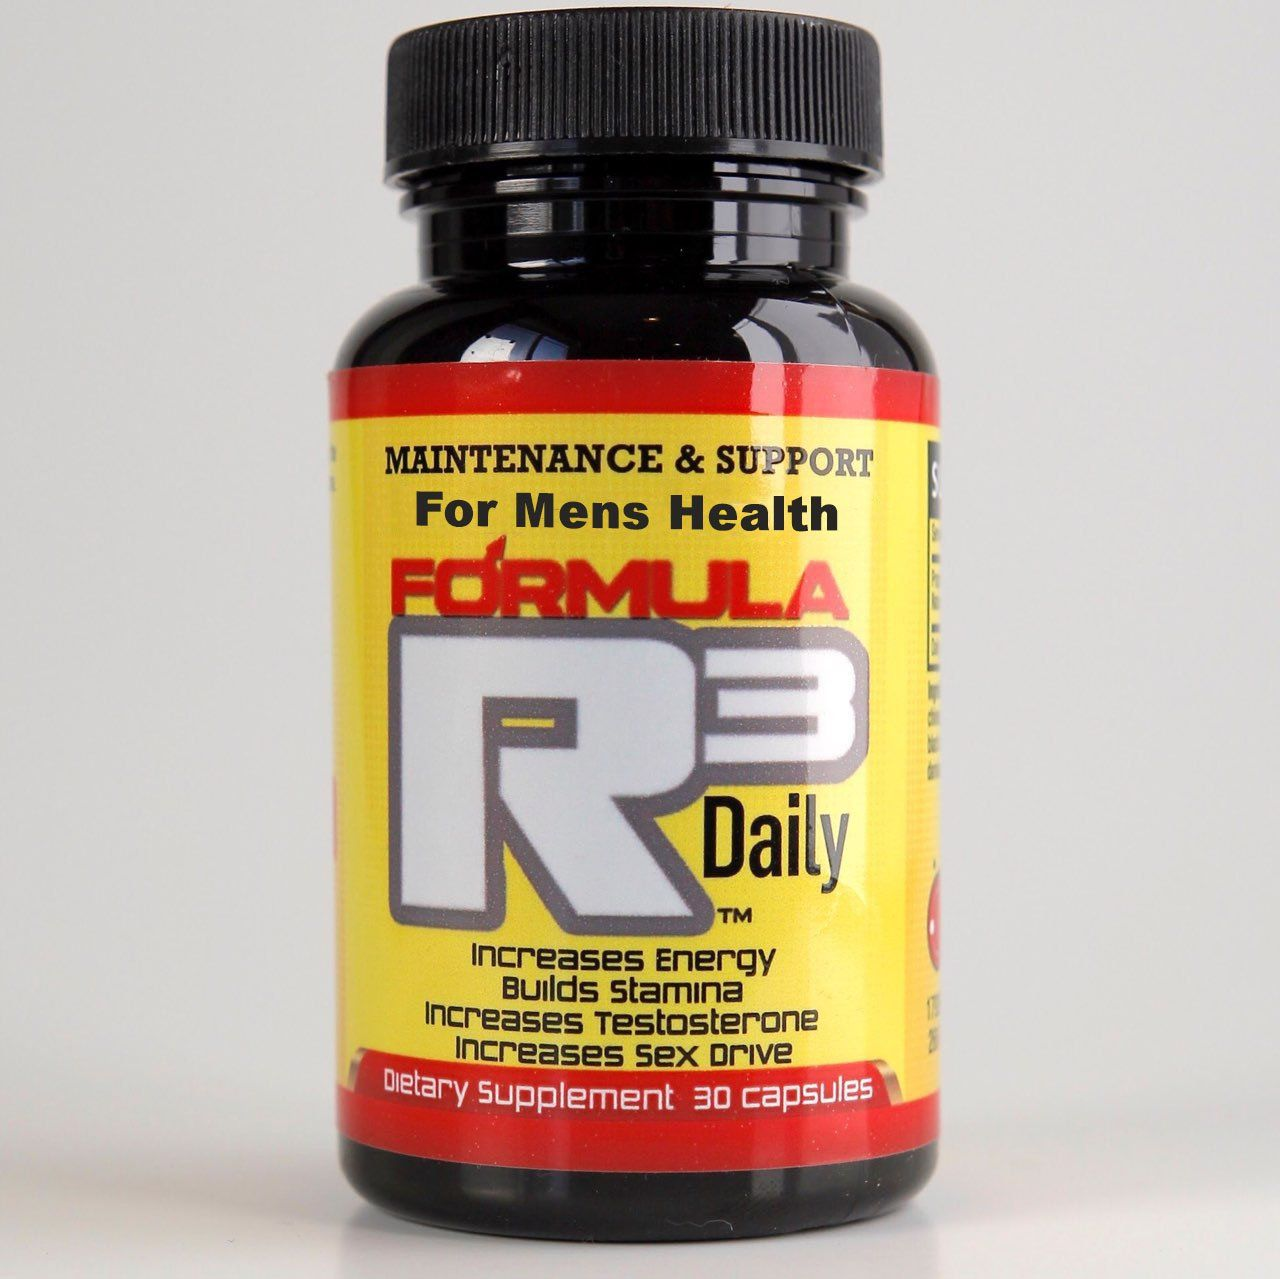 Formula R3 Daily Men S Health Supplement Male Enhancement